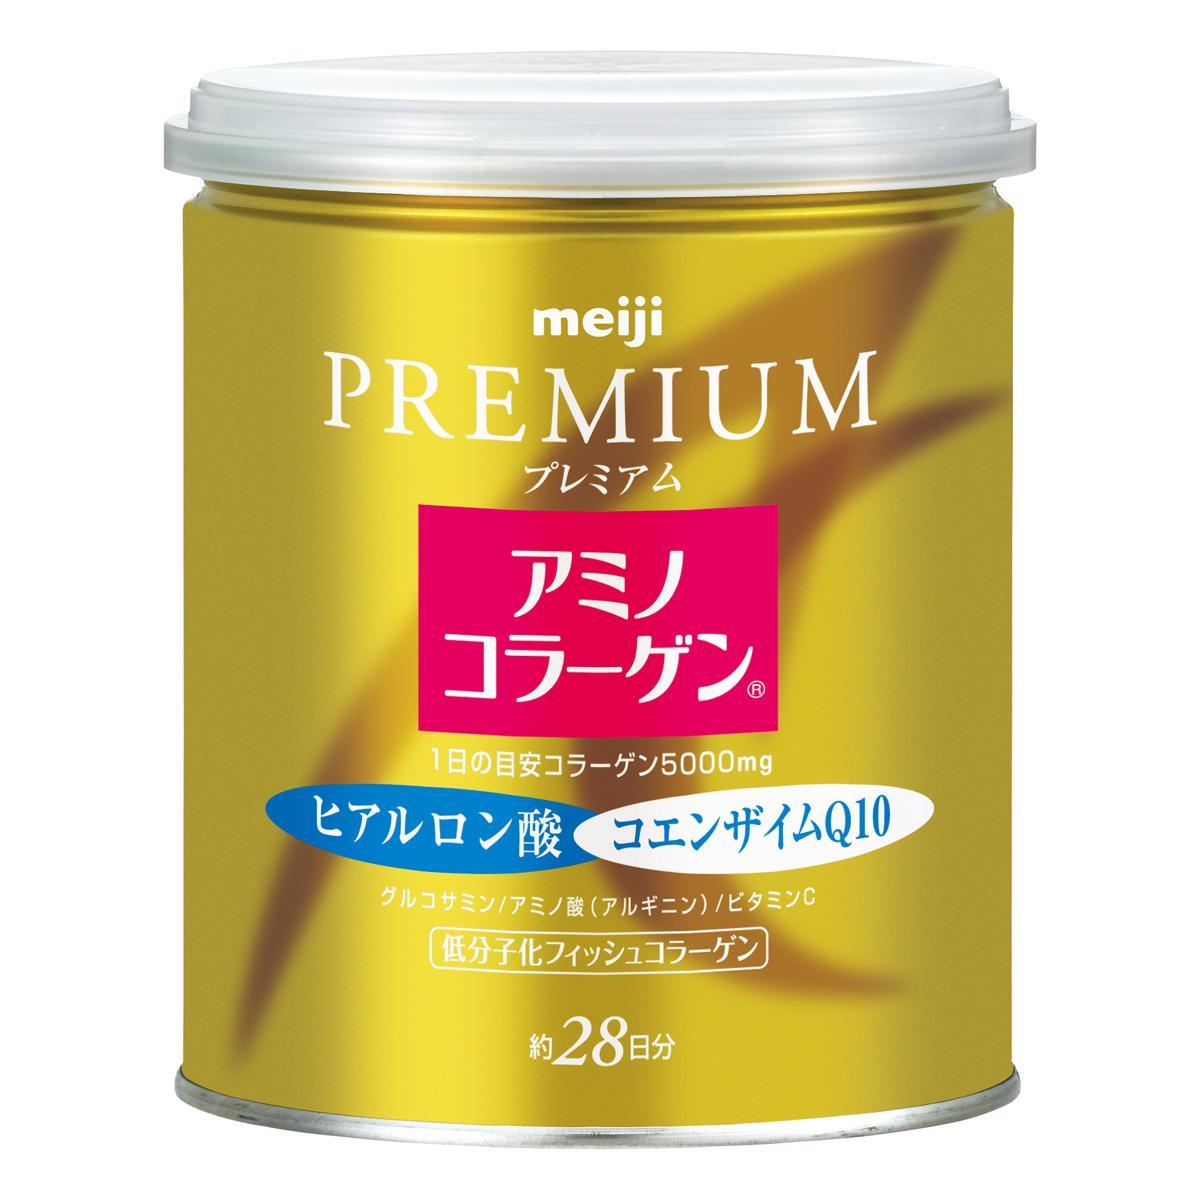 Premium Amino Collagen meiji เมจิ อะมิโน คอลลาเจน แบบกระป๋อง สำหรับรับประทาน 28วัน